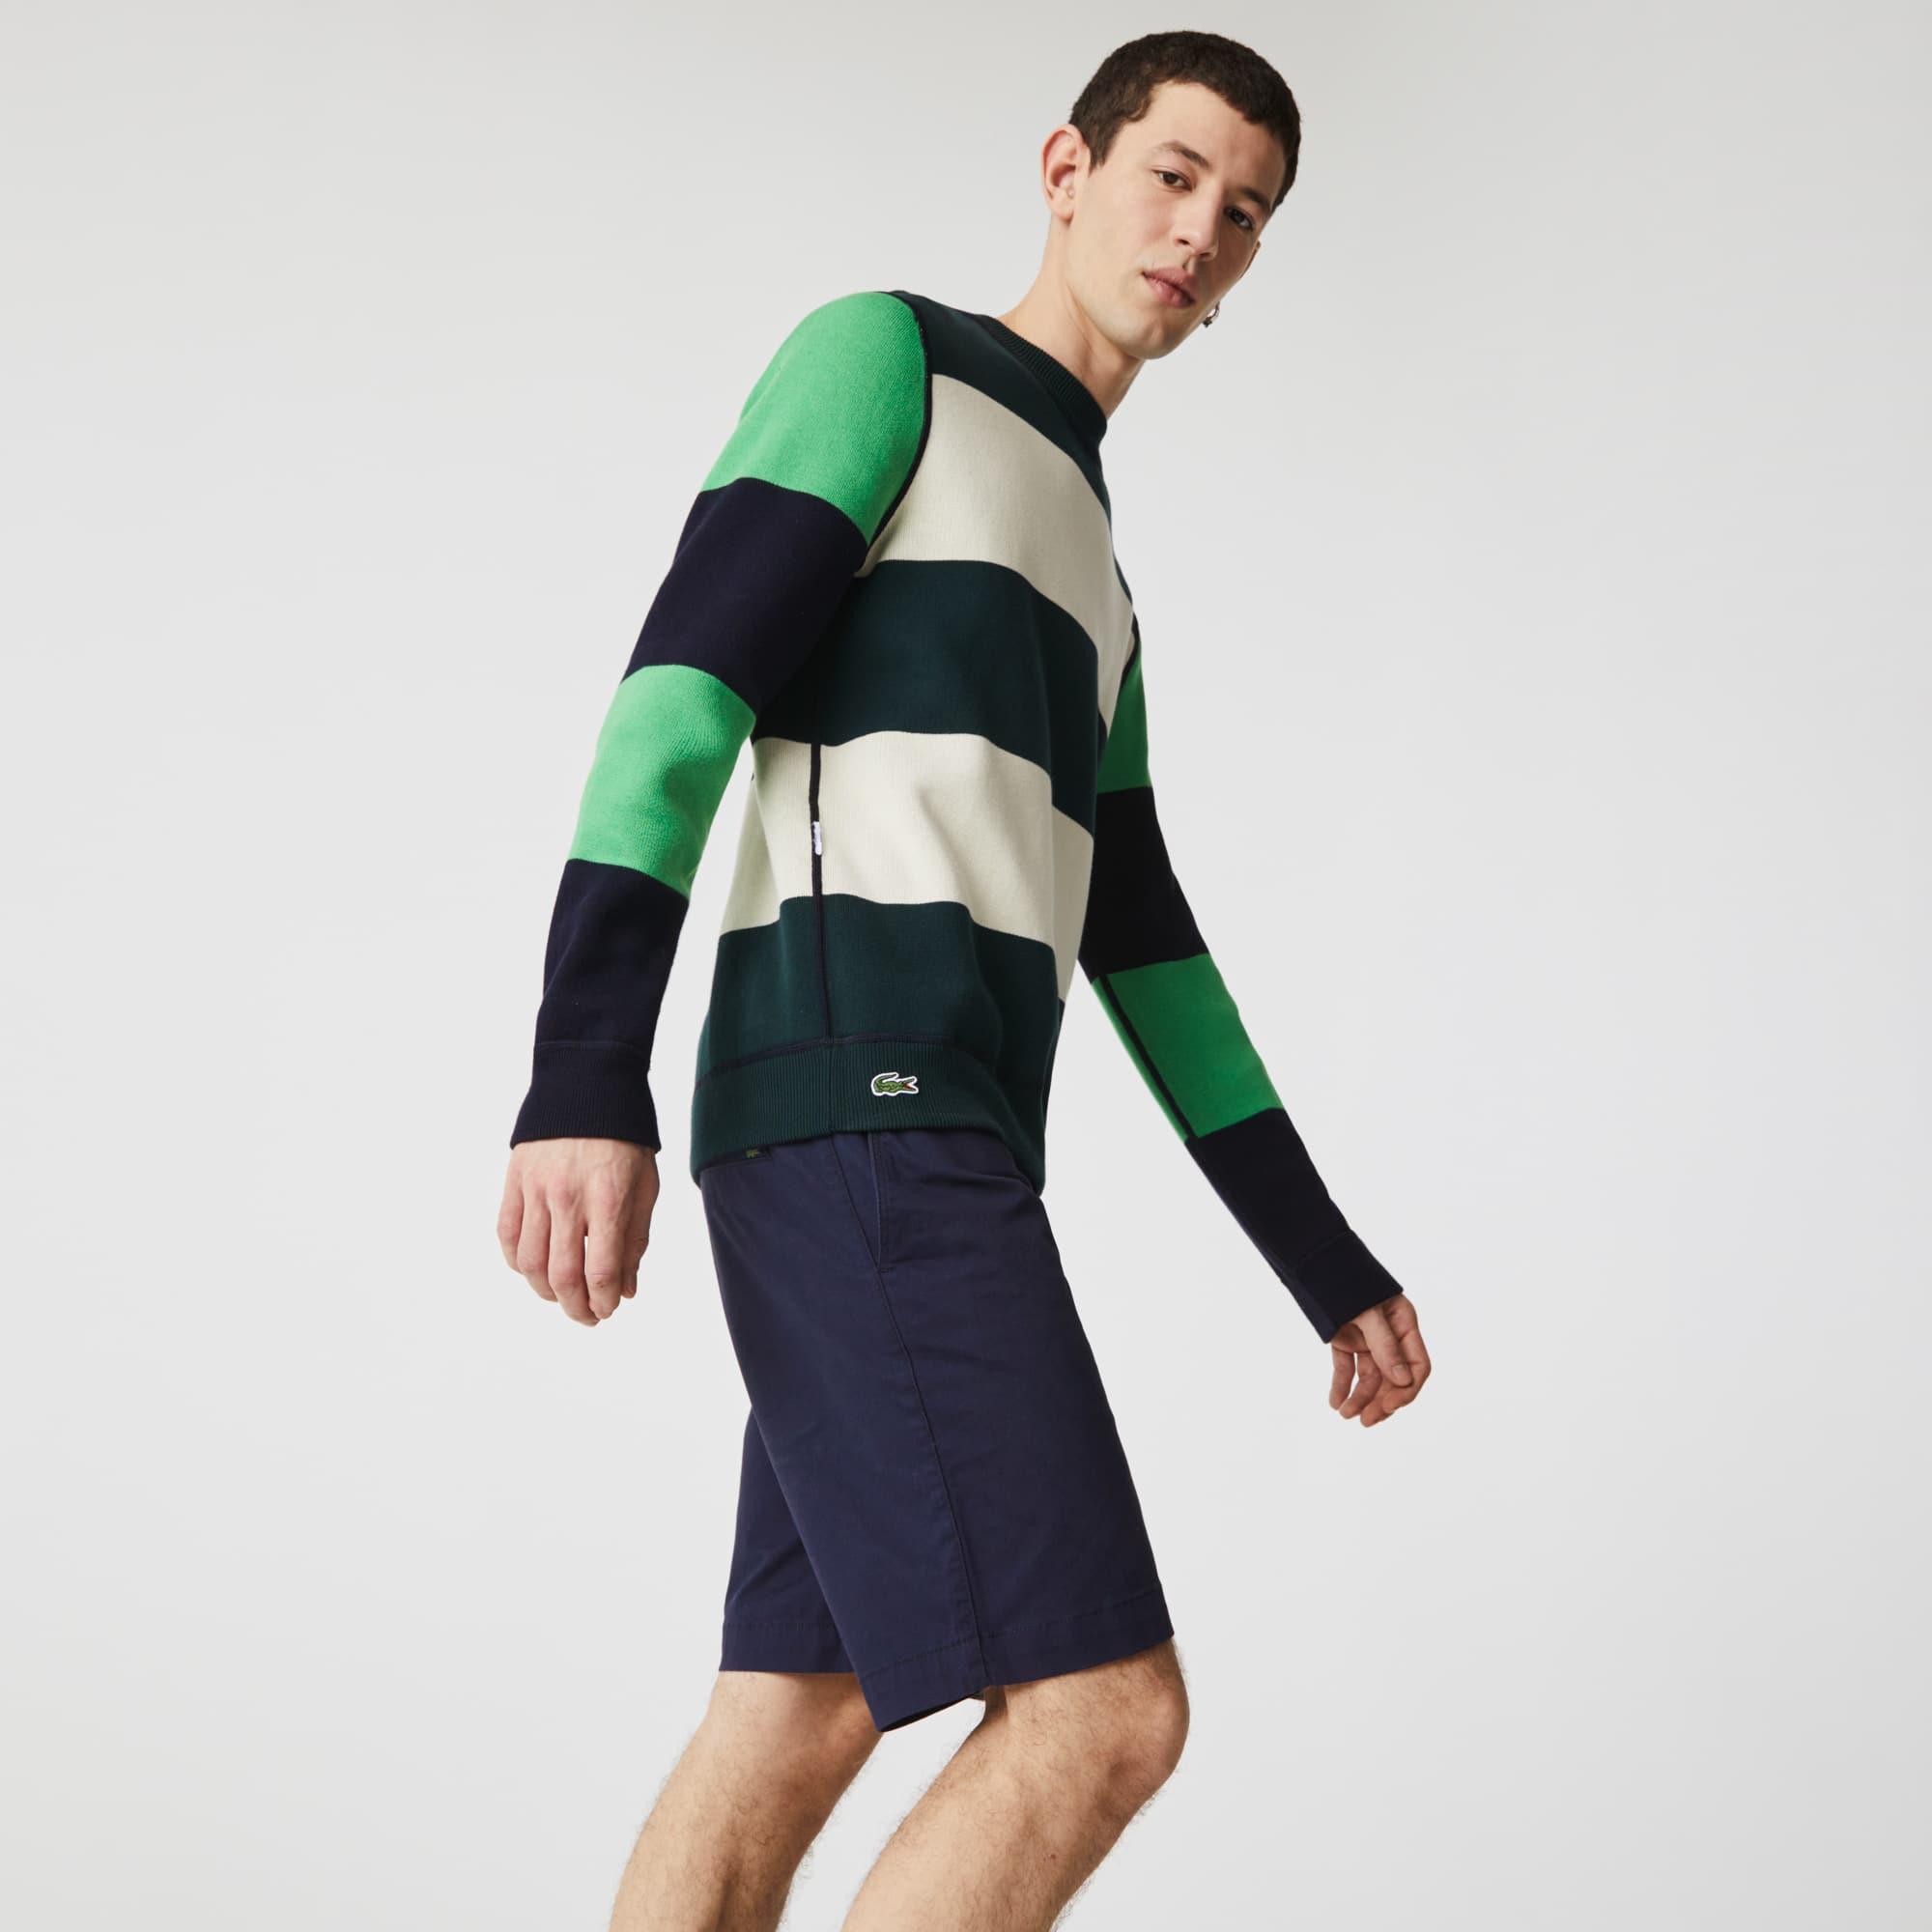 Korte Witte Broek Heren.Trousers And Shorts For Men Men S Fashion Lacoste